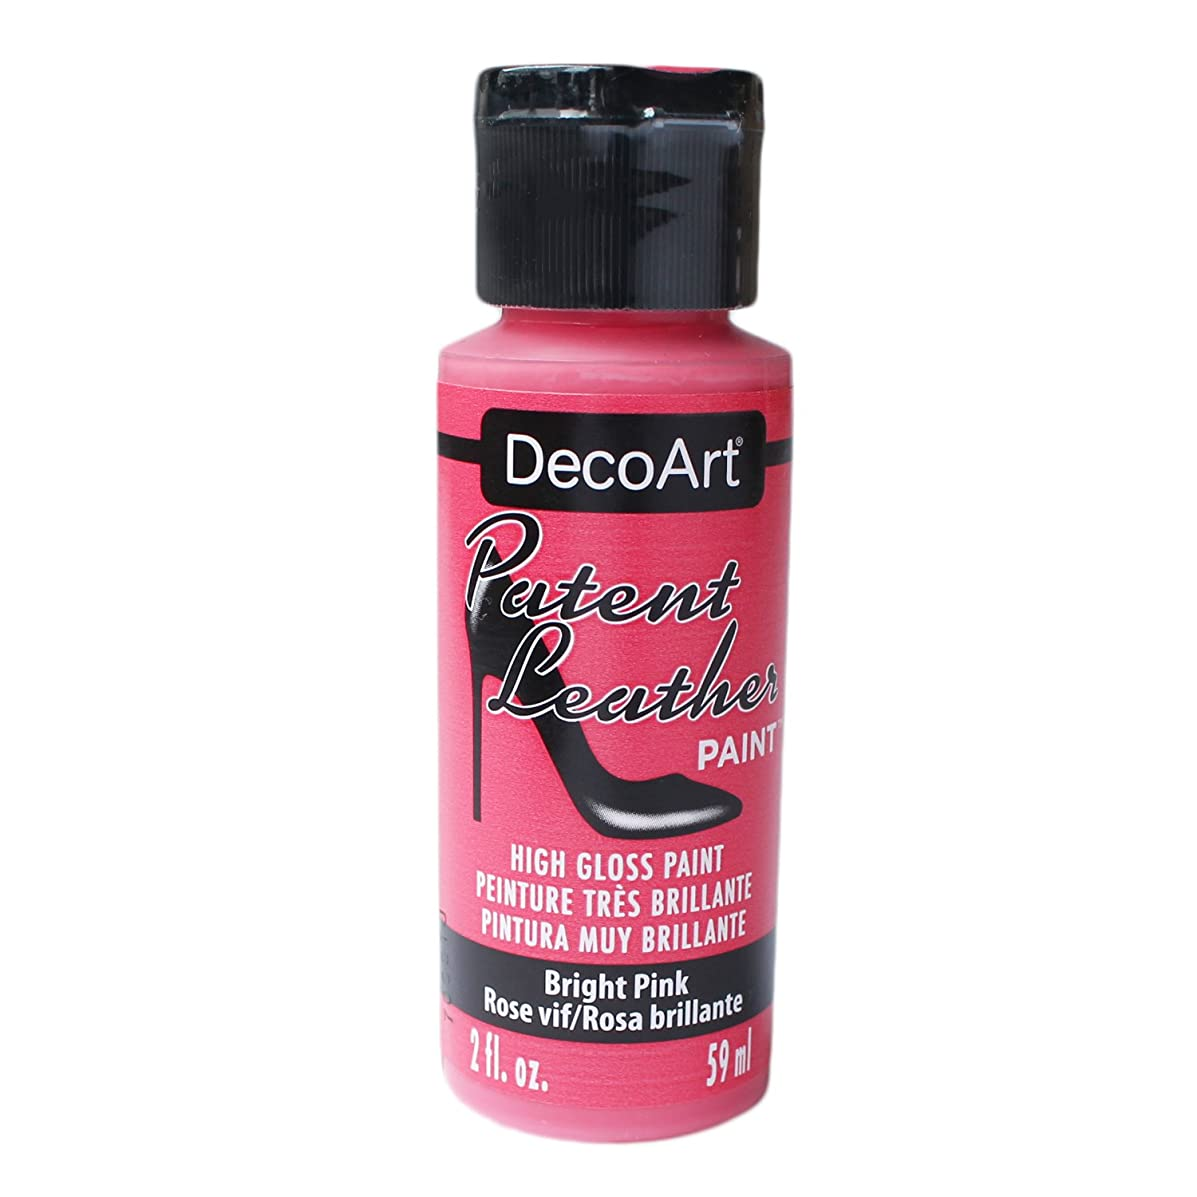 Deco Art DPL05-30 Bright Art Paint, Pink